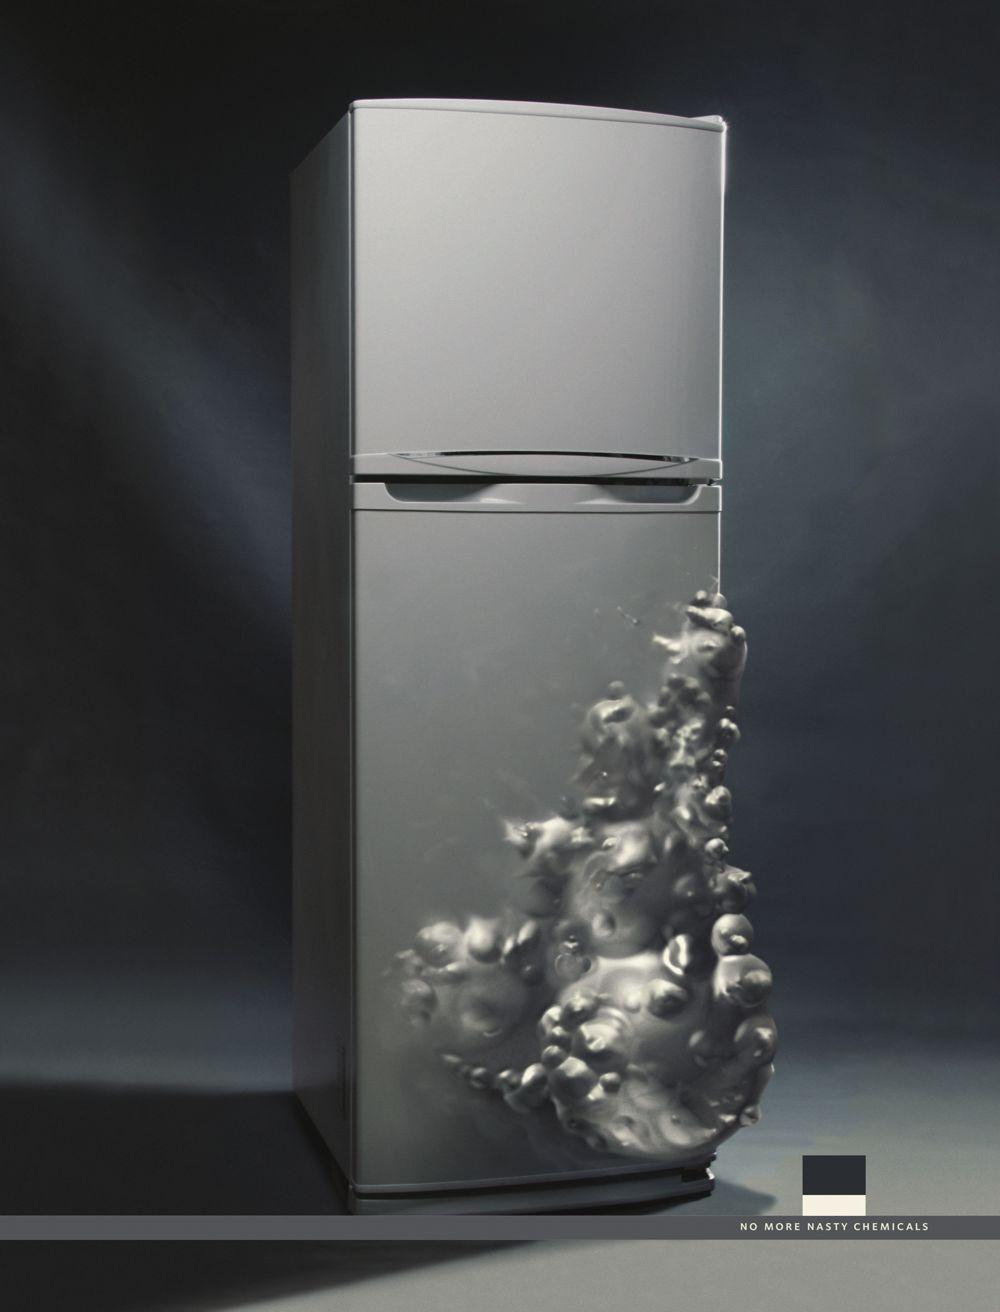 fridge cancer5_Shaun Pettigrew.jpg